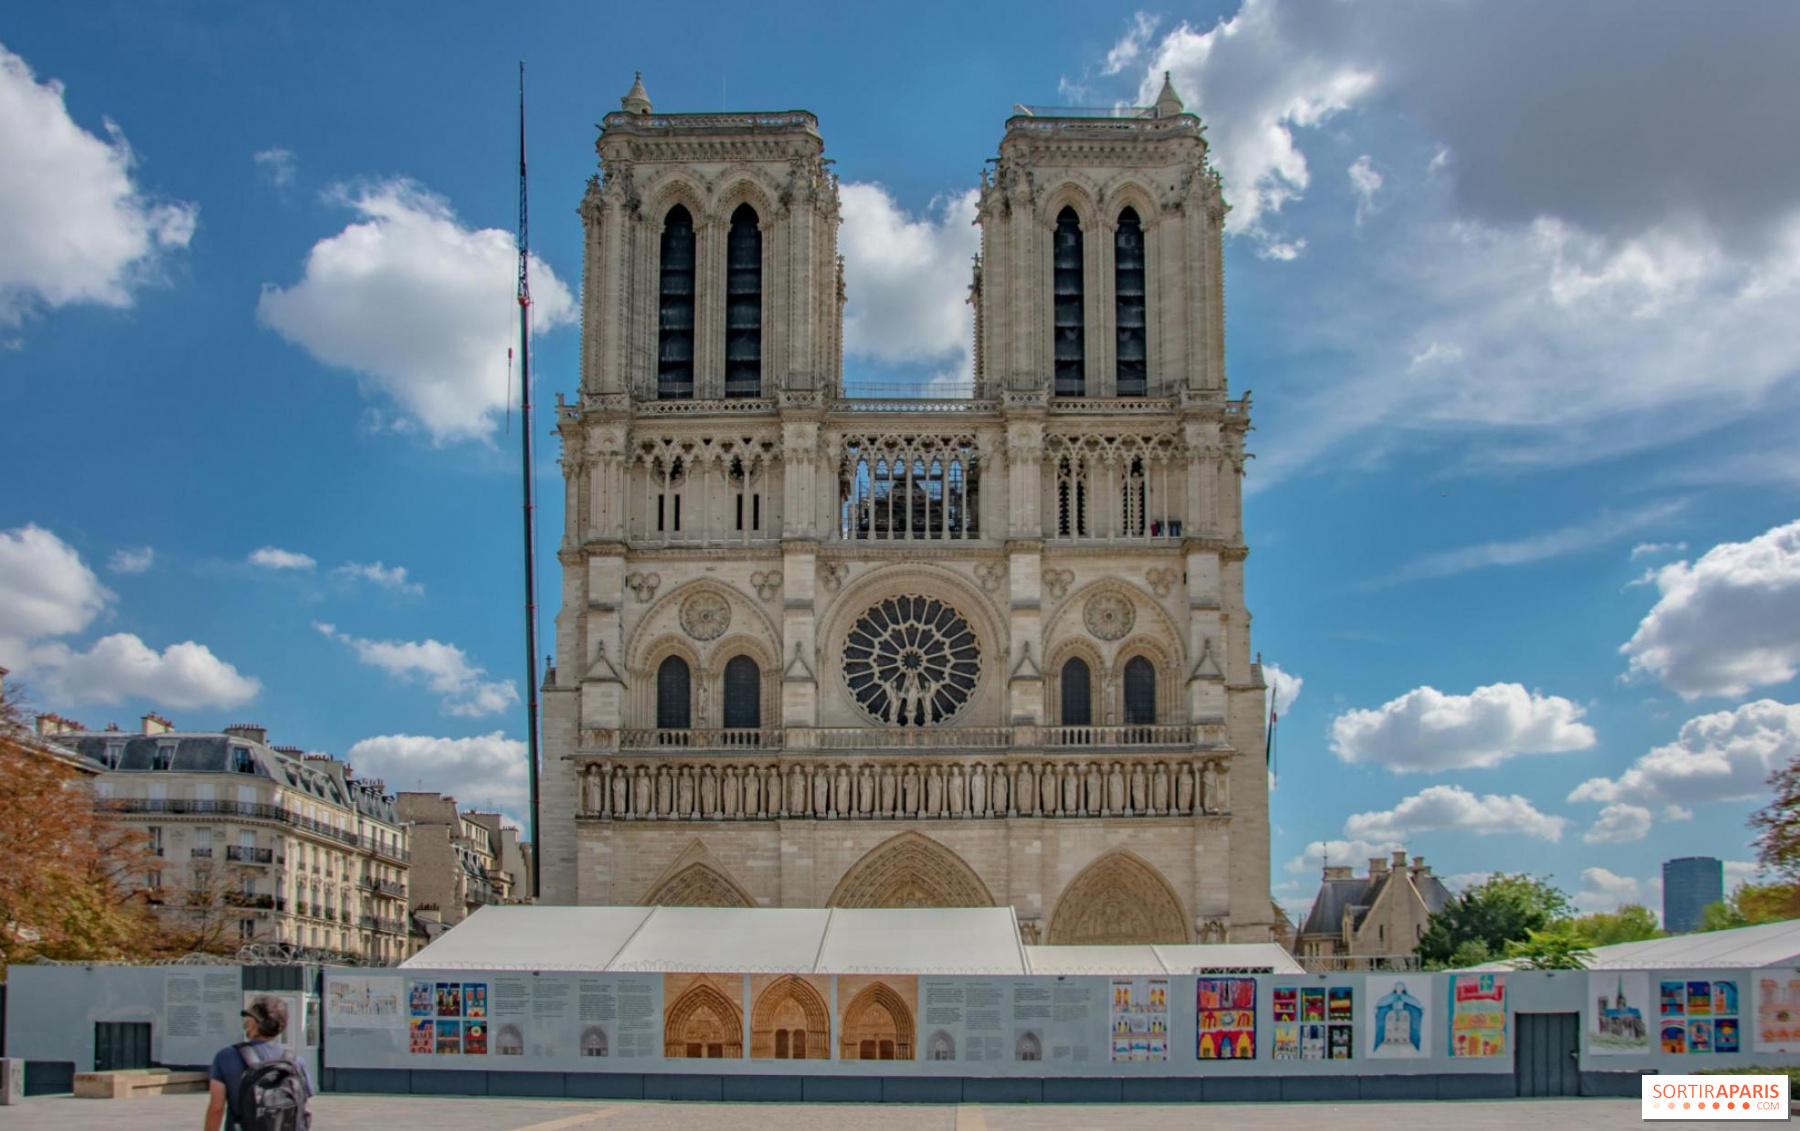 Notre Dame Paris Christmas Mass 2021 Notre Dame De Paris Renovations Not To Be Done Before 2025 Sortiraparis Com